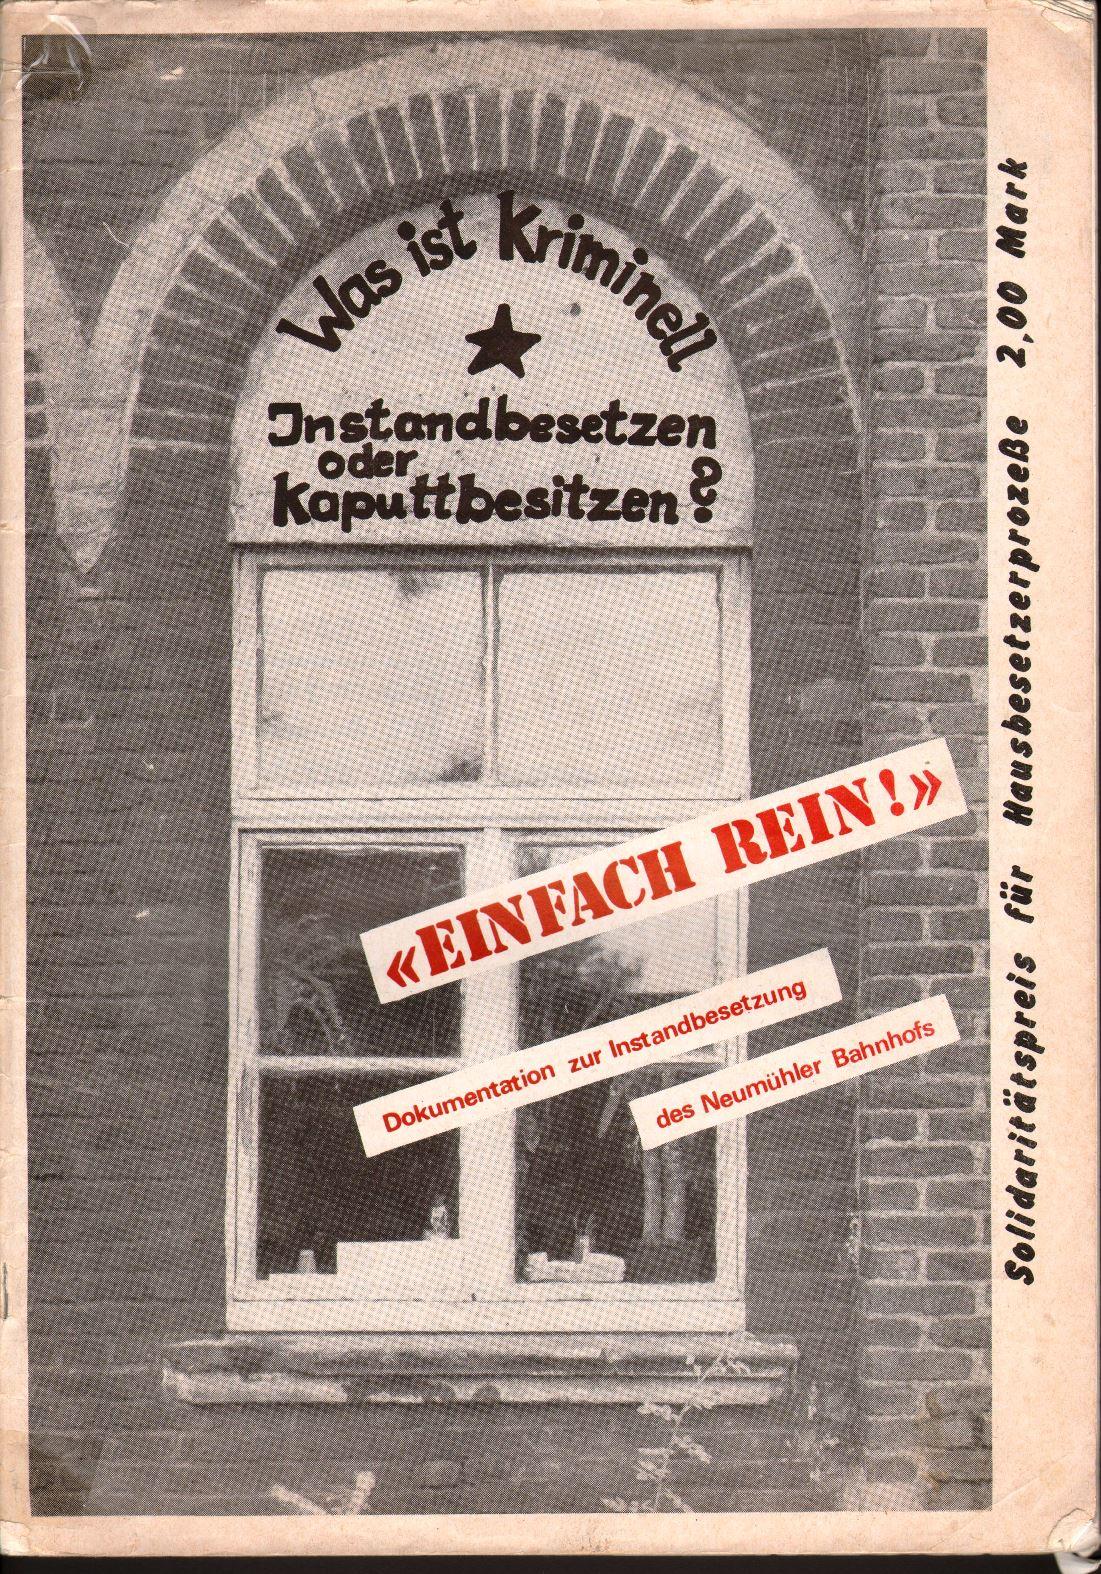 Duisburg_1981_Doku_Neumuehler_Bahnhof_01